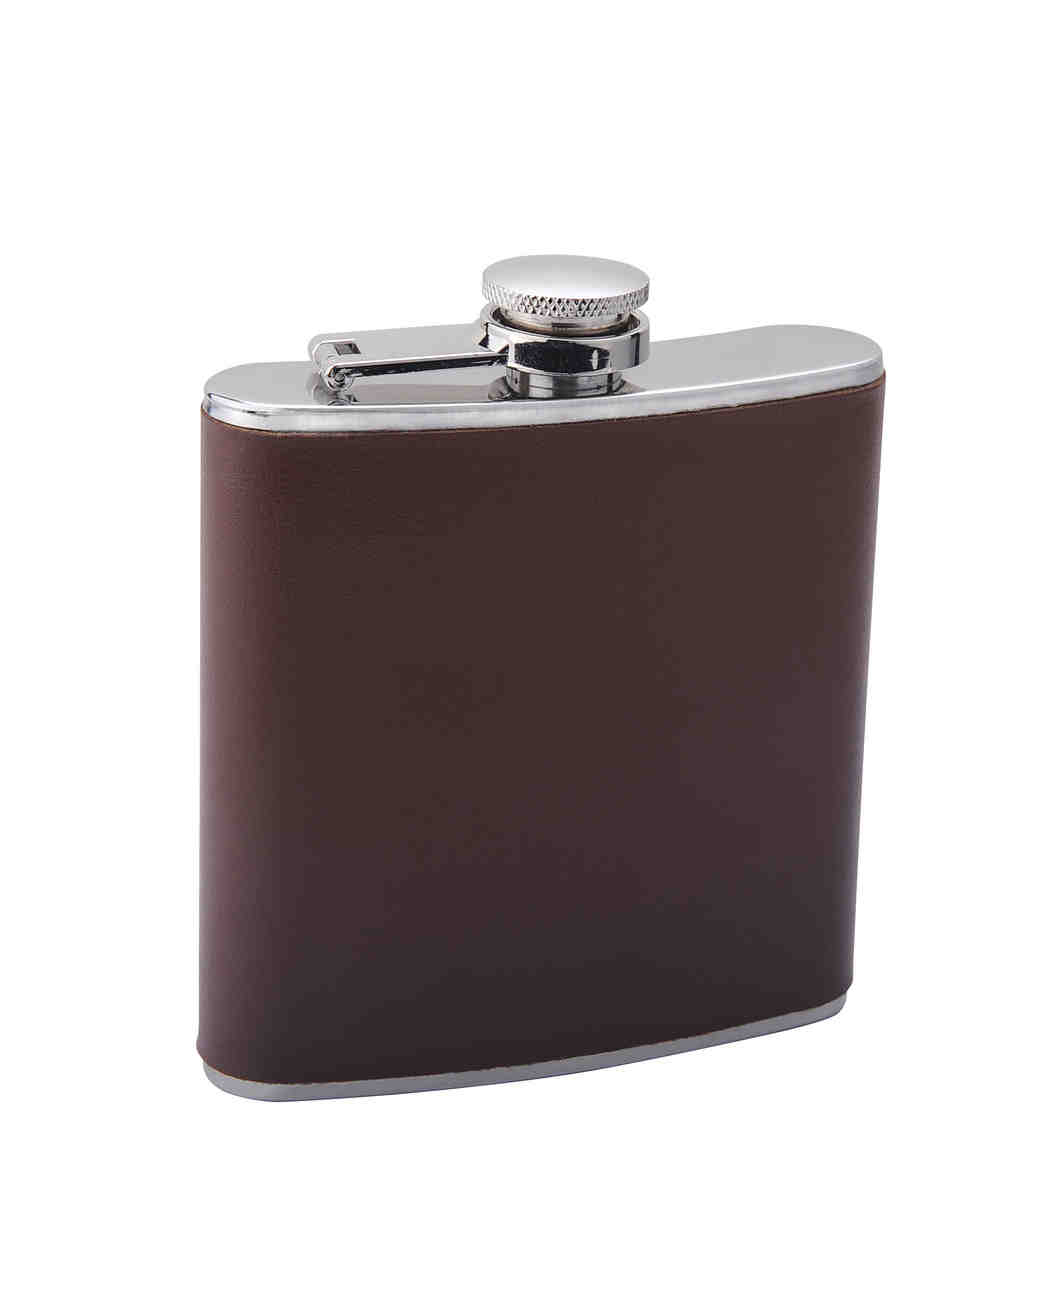 leather-metal-flask-0216.jpg